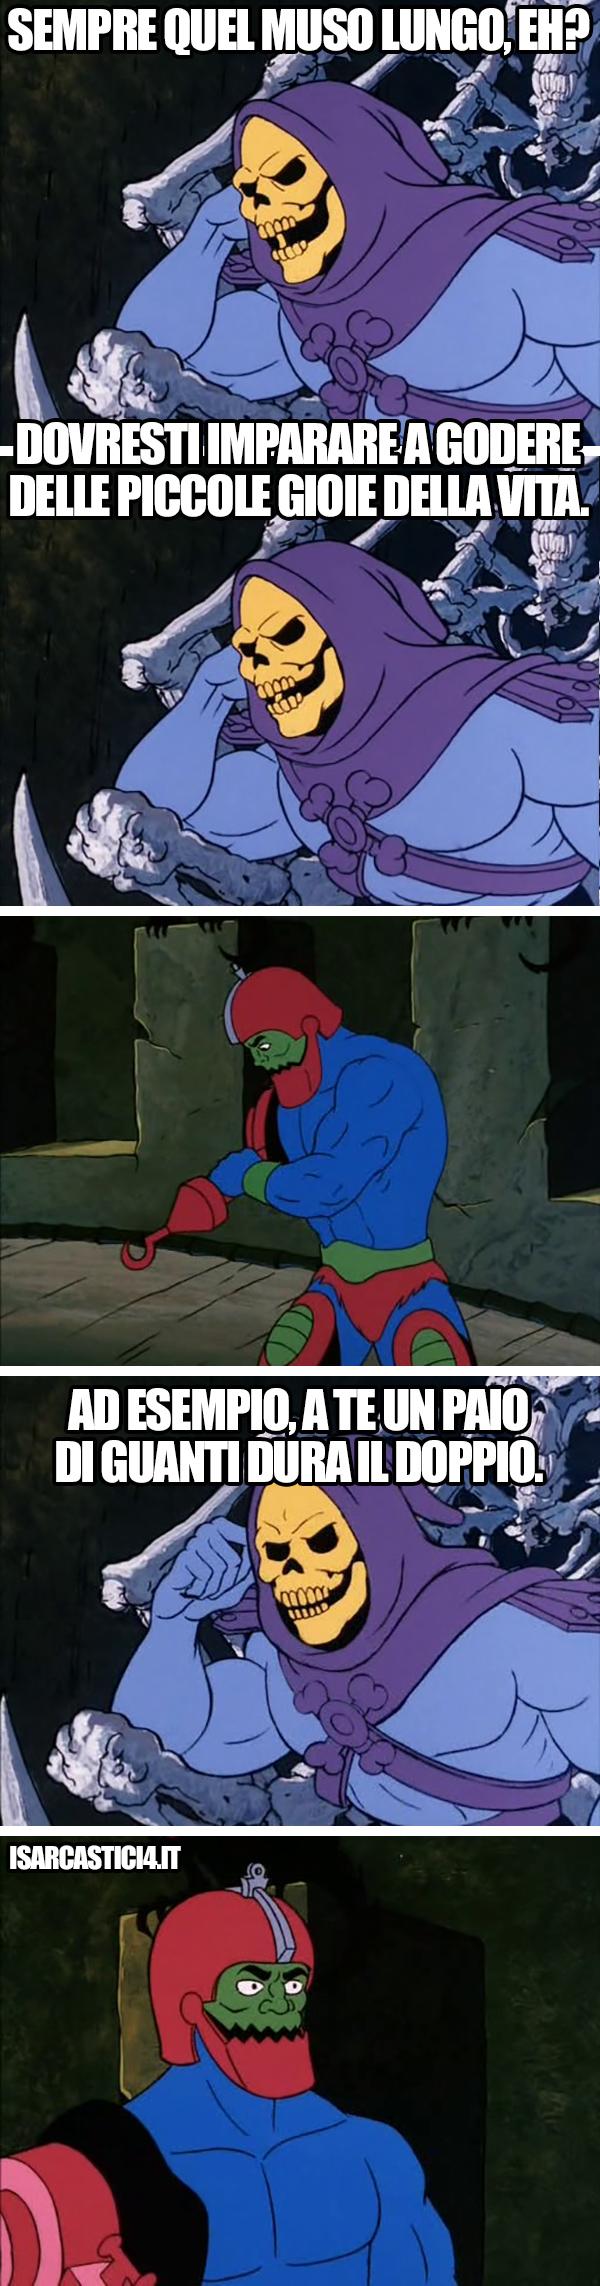 MOTU, Masters Of The Universe meme ita - Muso lungo